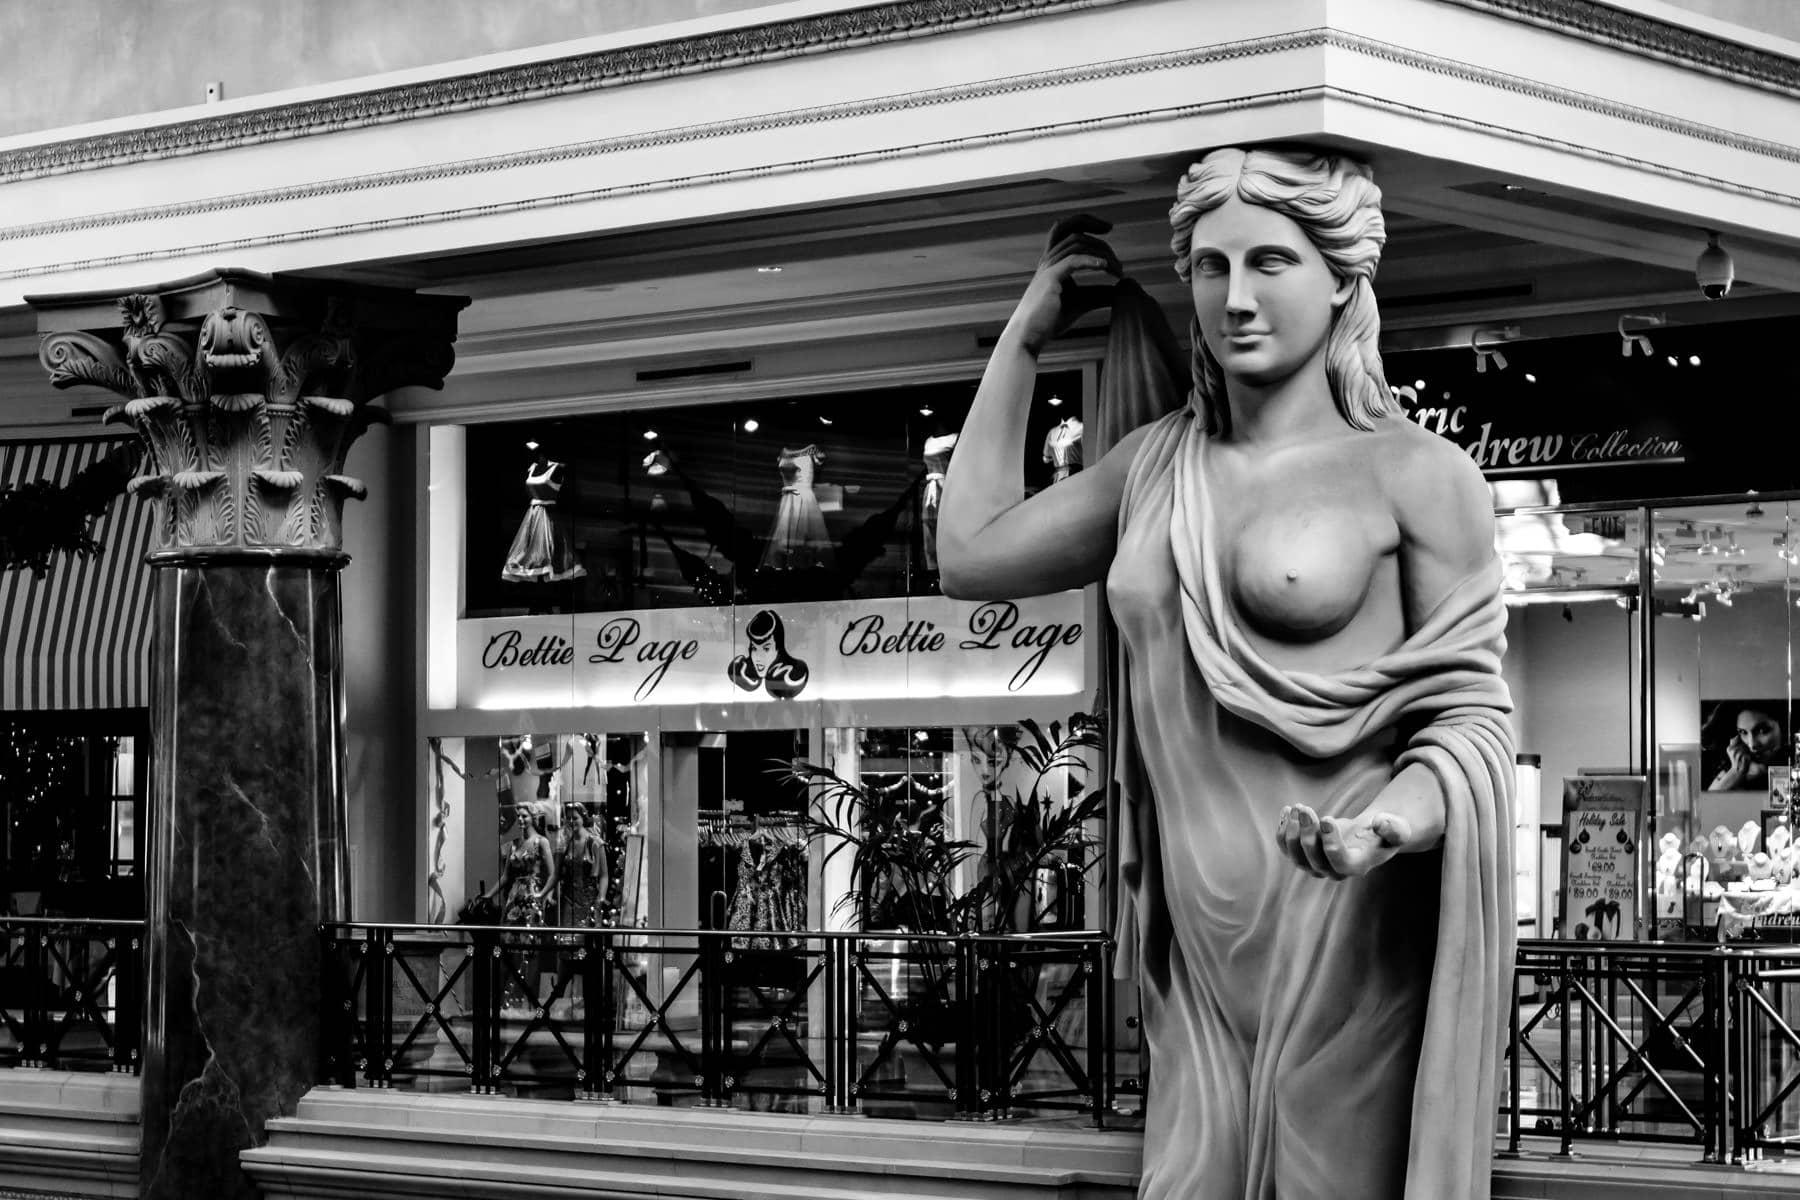 Interior statuary at the Forum Shops at Caesars Palace, Las Vegas.